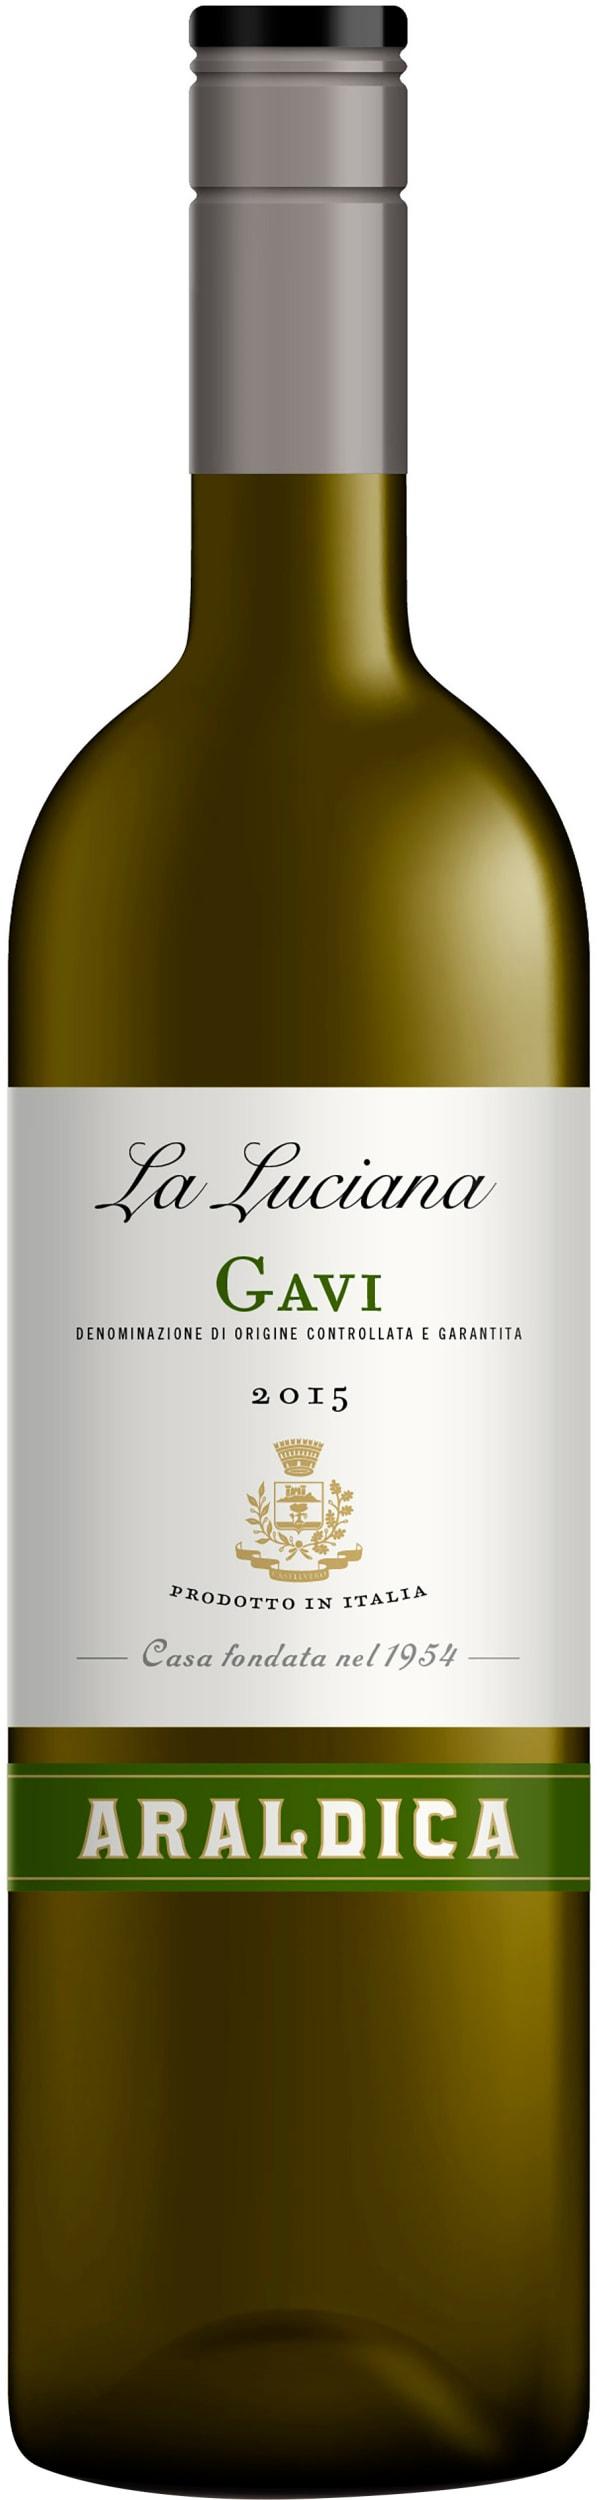 La Luciana Gavi 2016